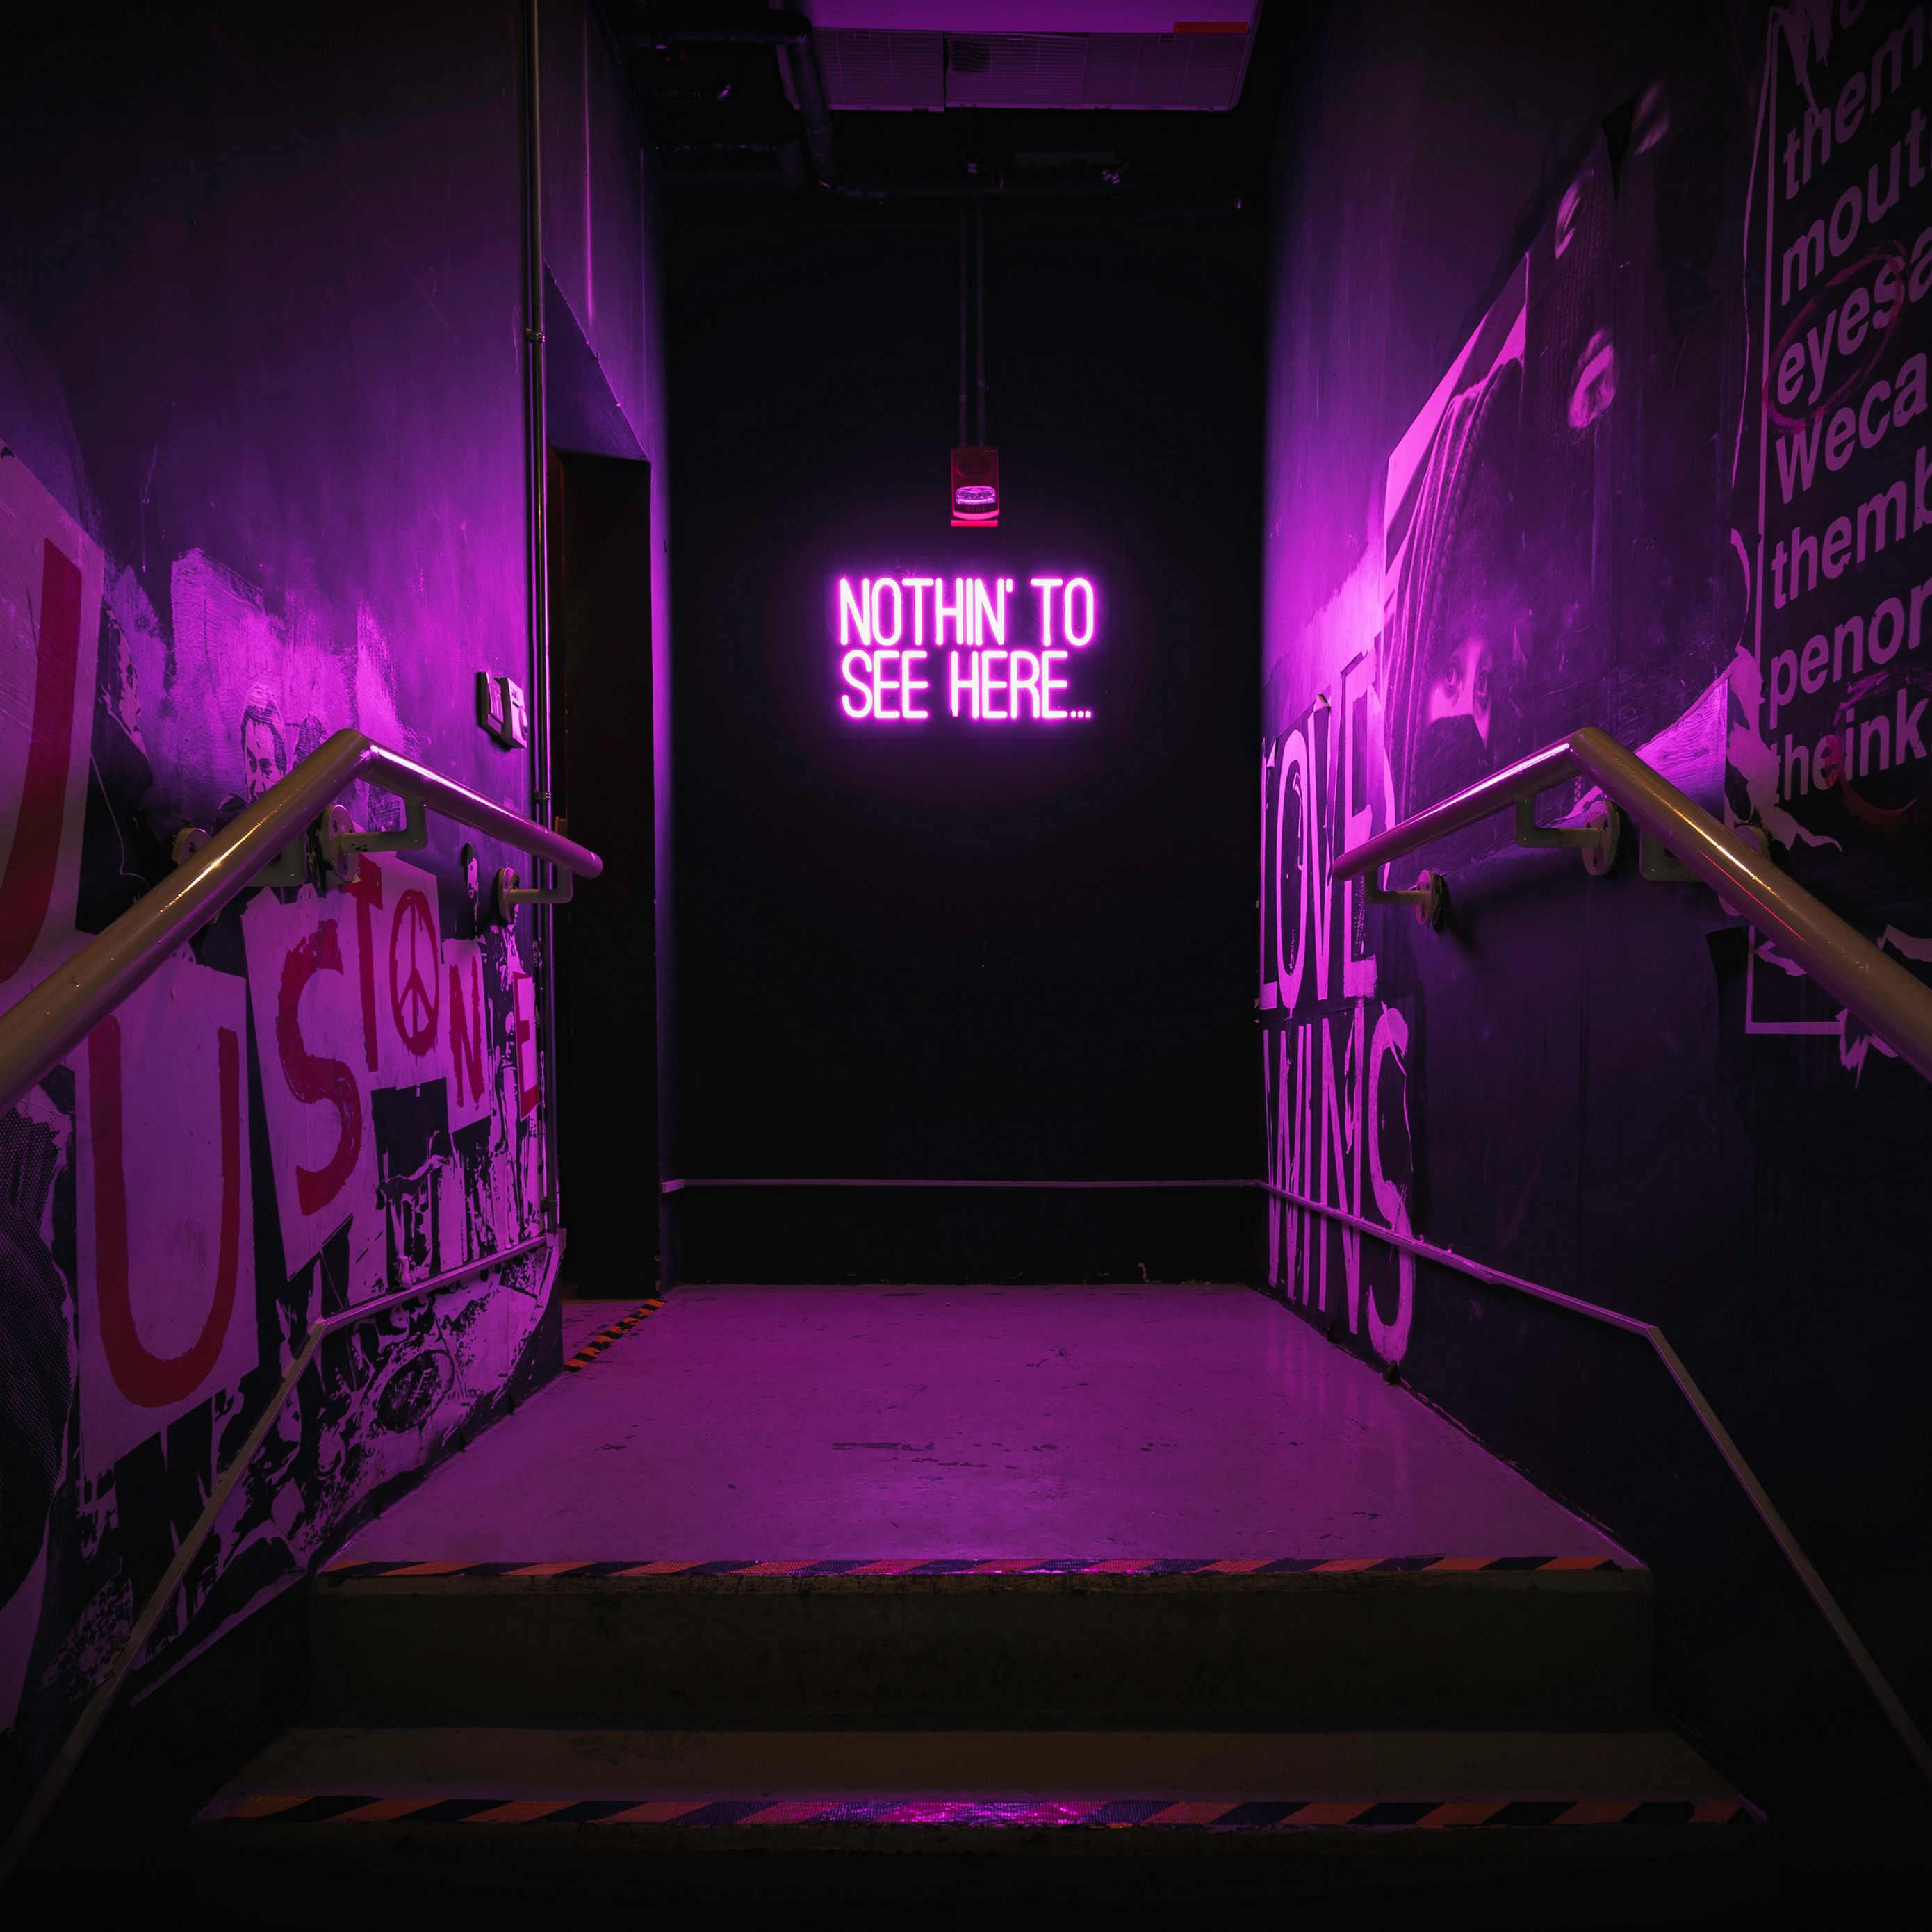 2780x2780 Wallpaper neon, inscription, wall, purple, backlight